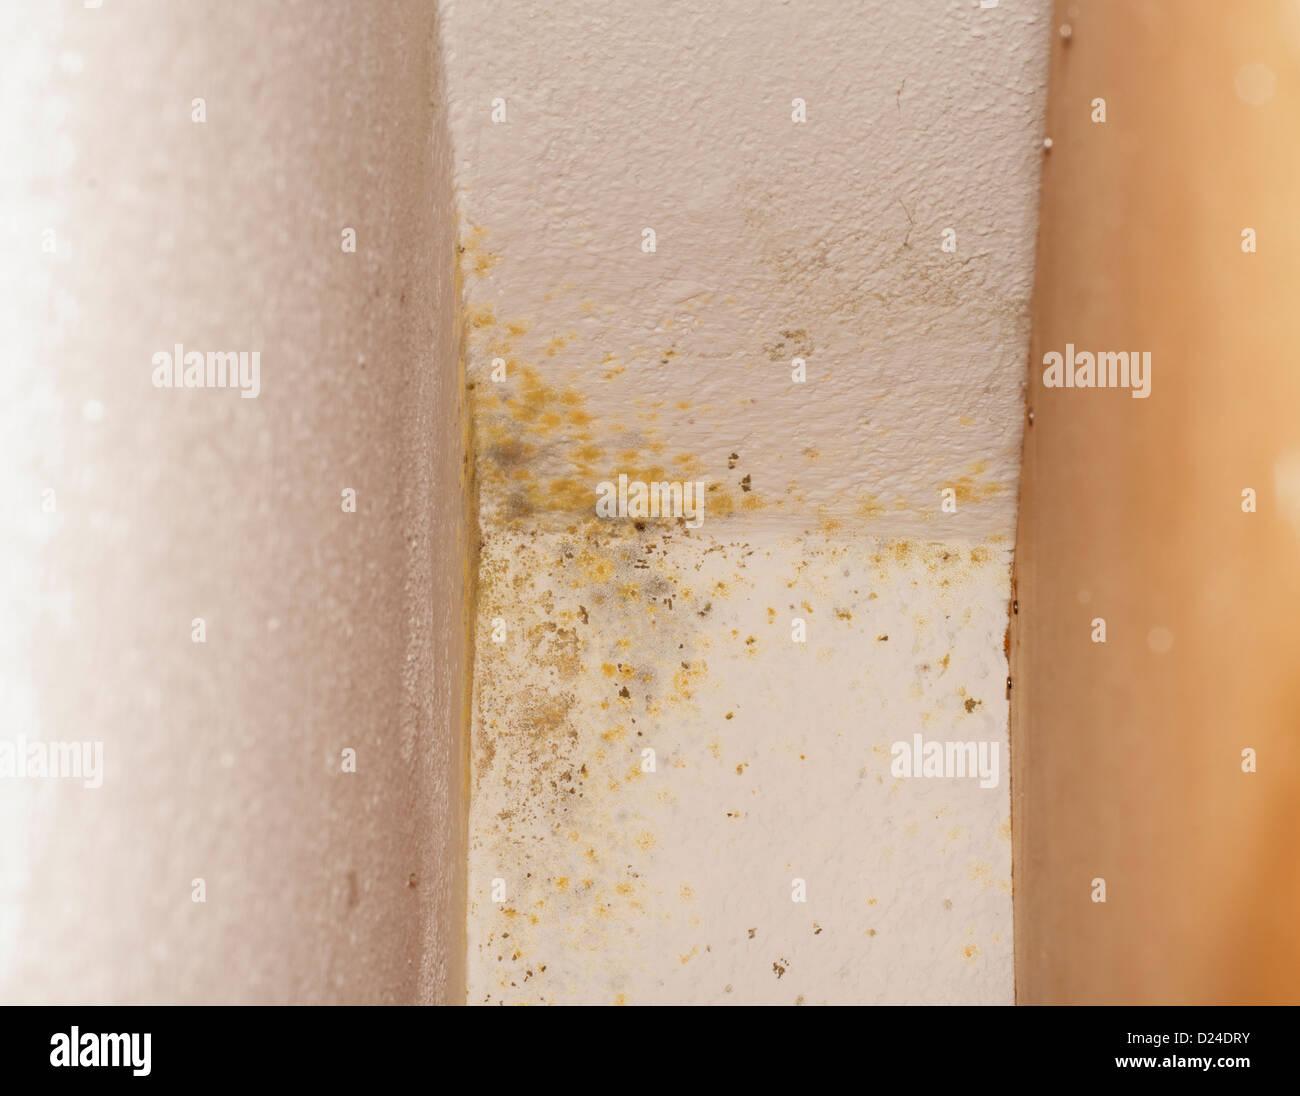 Mold on walls - Stock Image